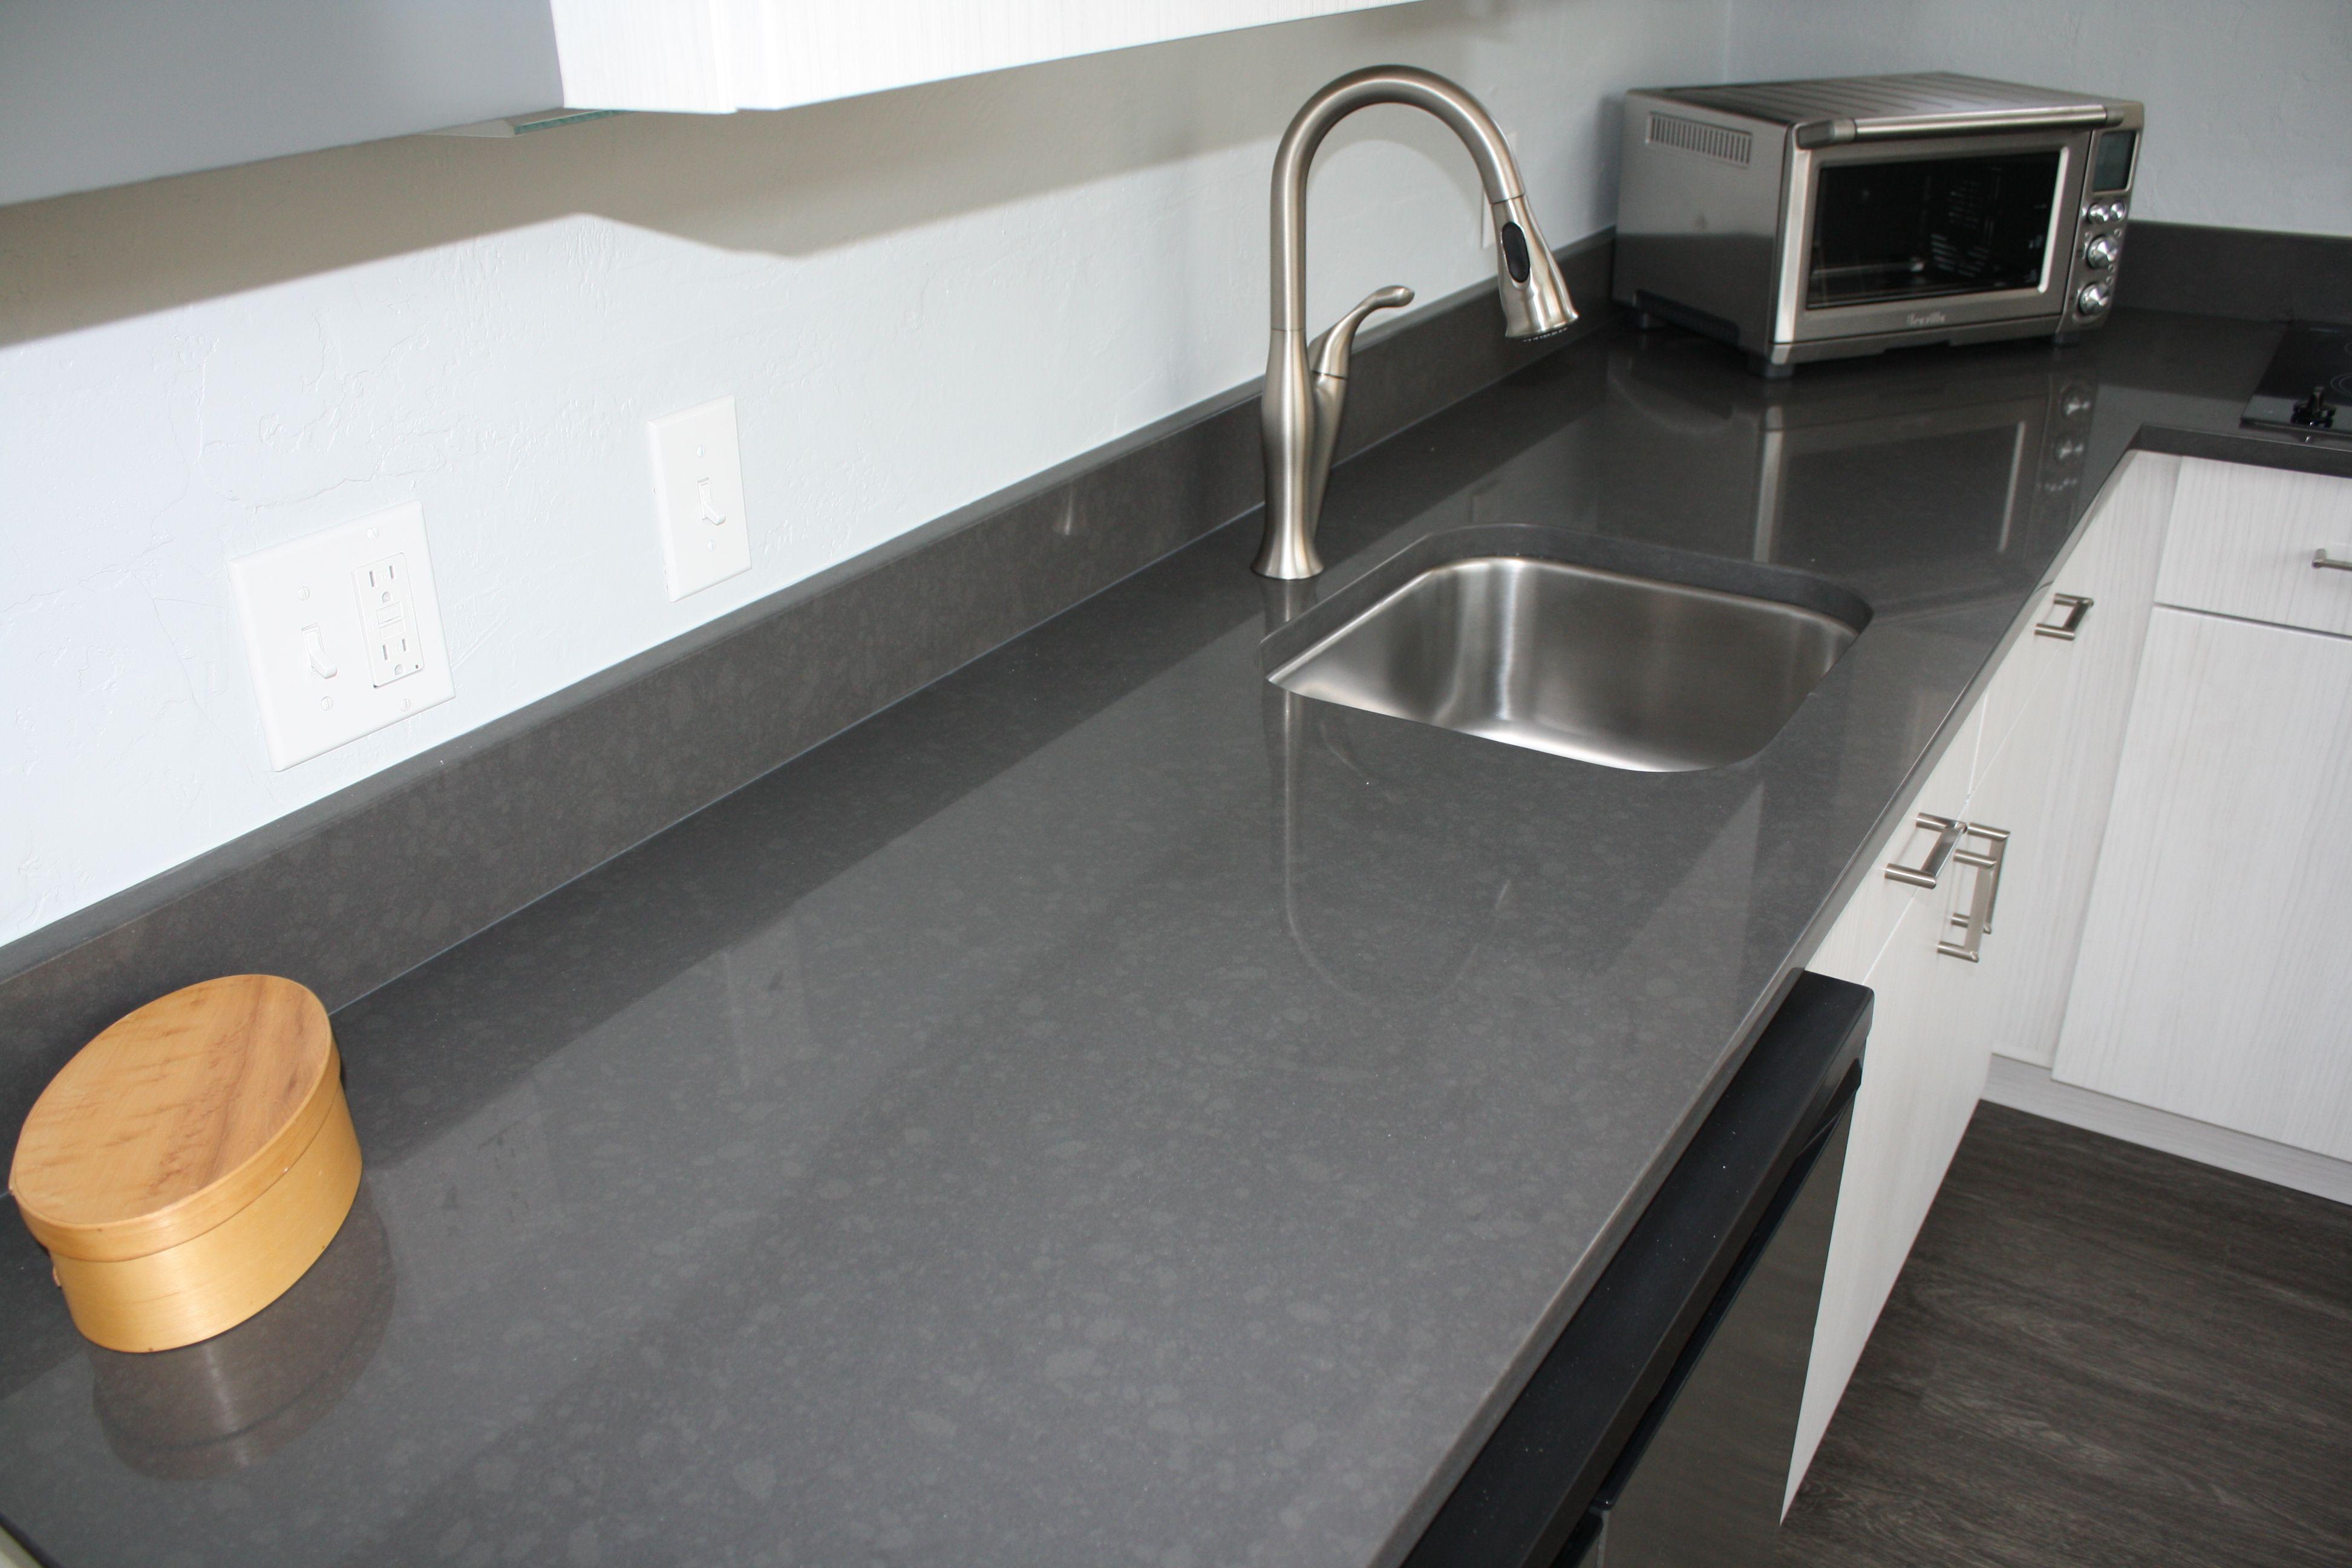 Merveilleux 3 Cm Coastal Grey Quartz With Undermount Sink.